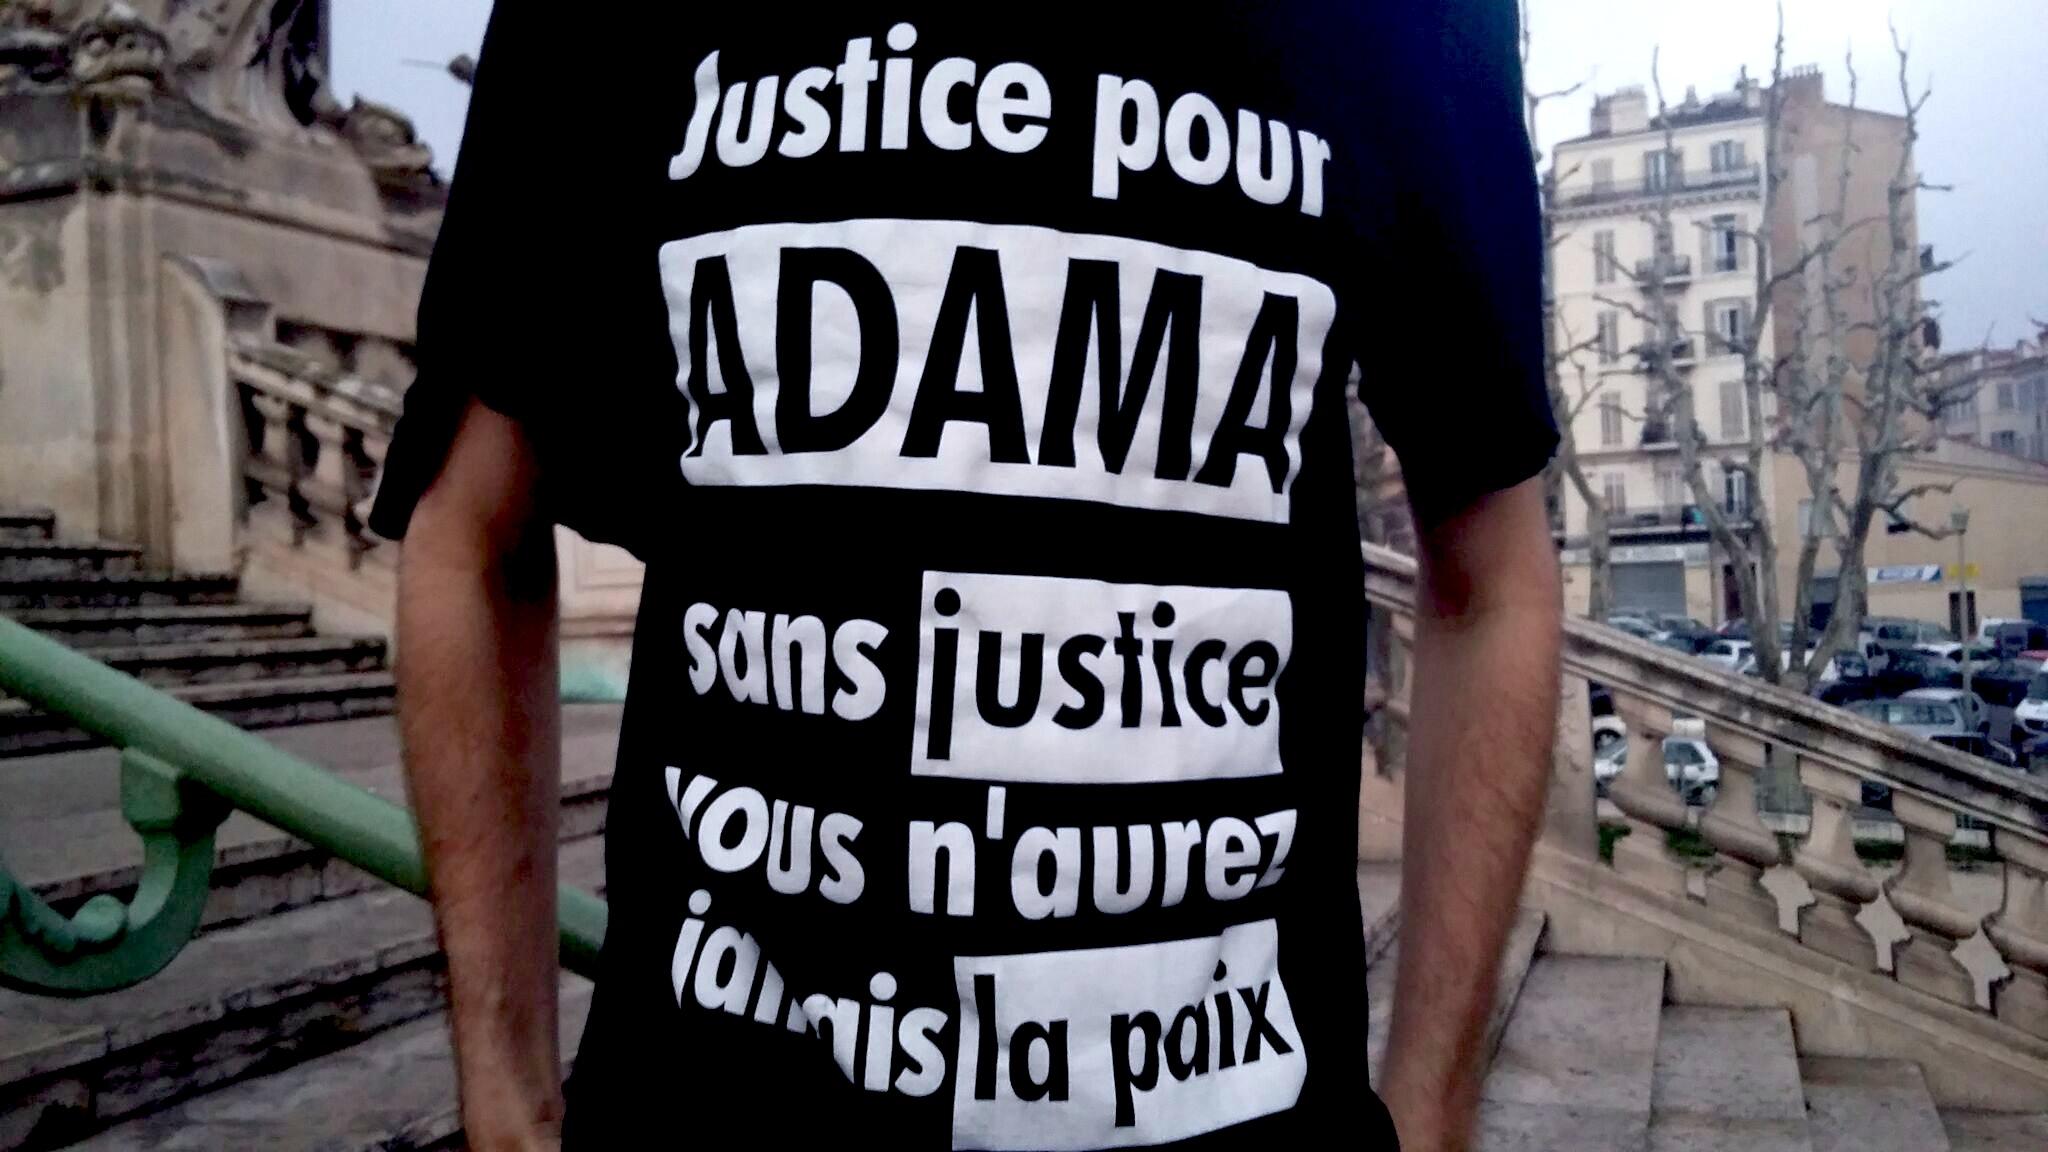 Justice pour ADAMA Marche Marseille 17/03/2017